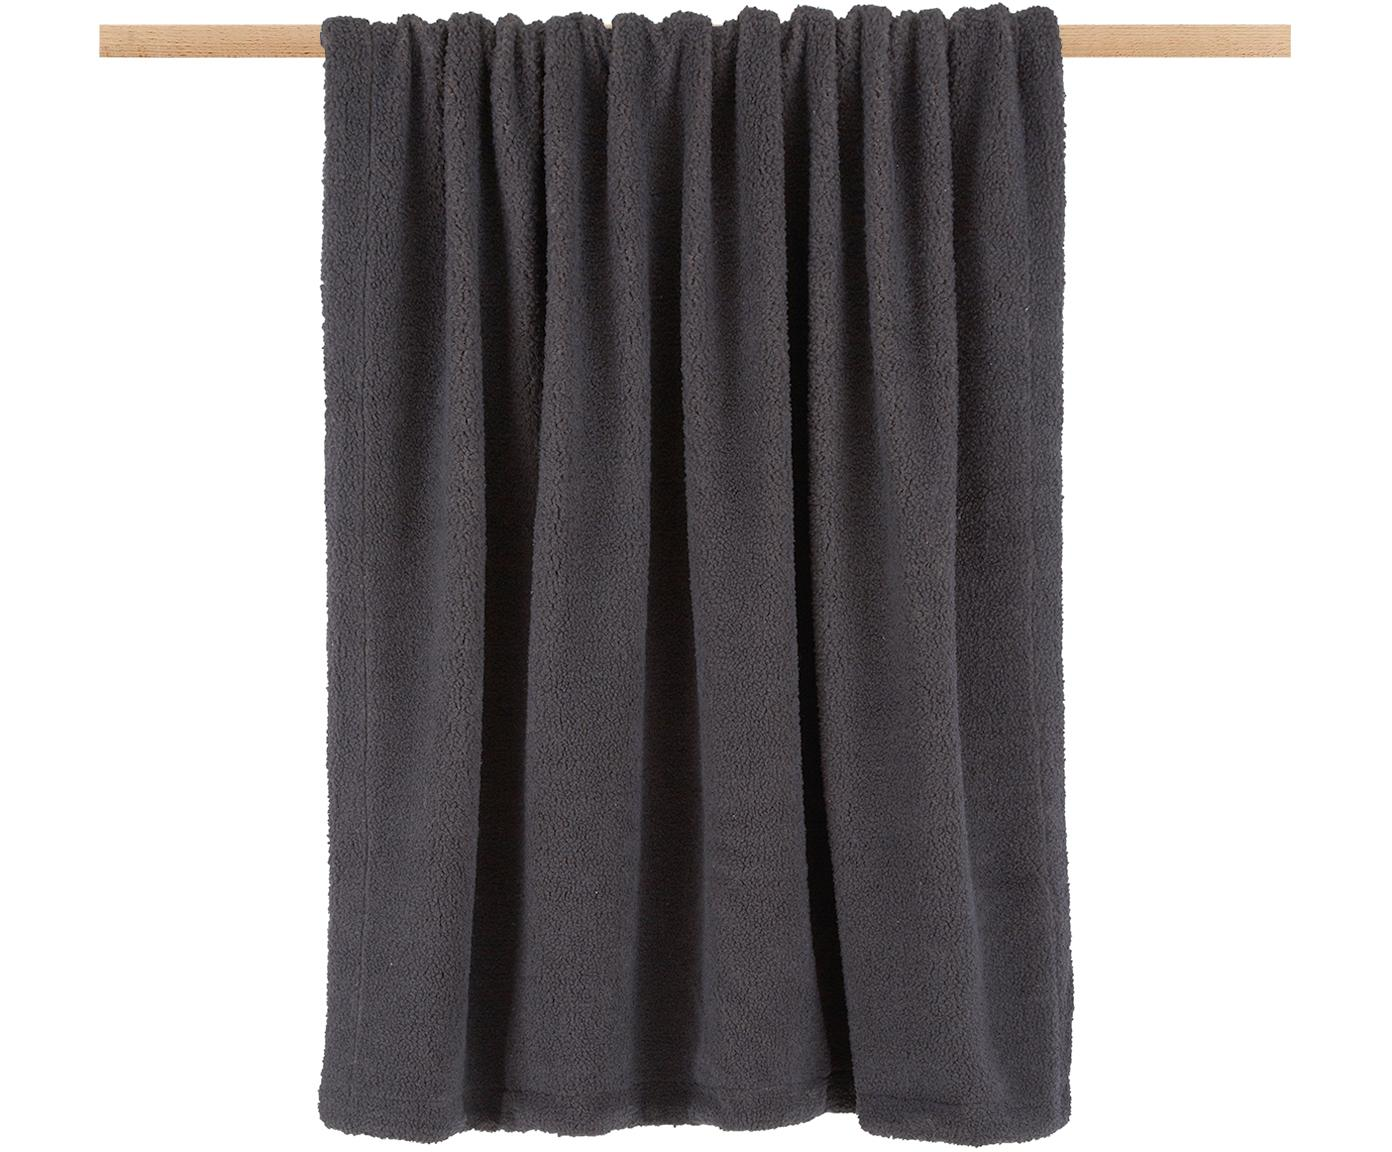 Teddy-Plaid Mille, Vorderseite: 100% Polyester (Teddyfell, Rückseite: 100% Polyester, Dunkelgrau, 150 x 200 cm